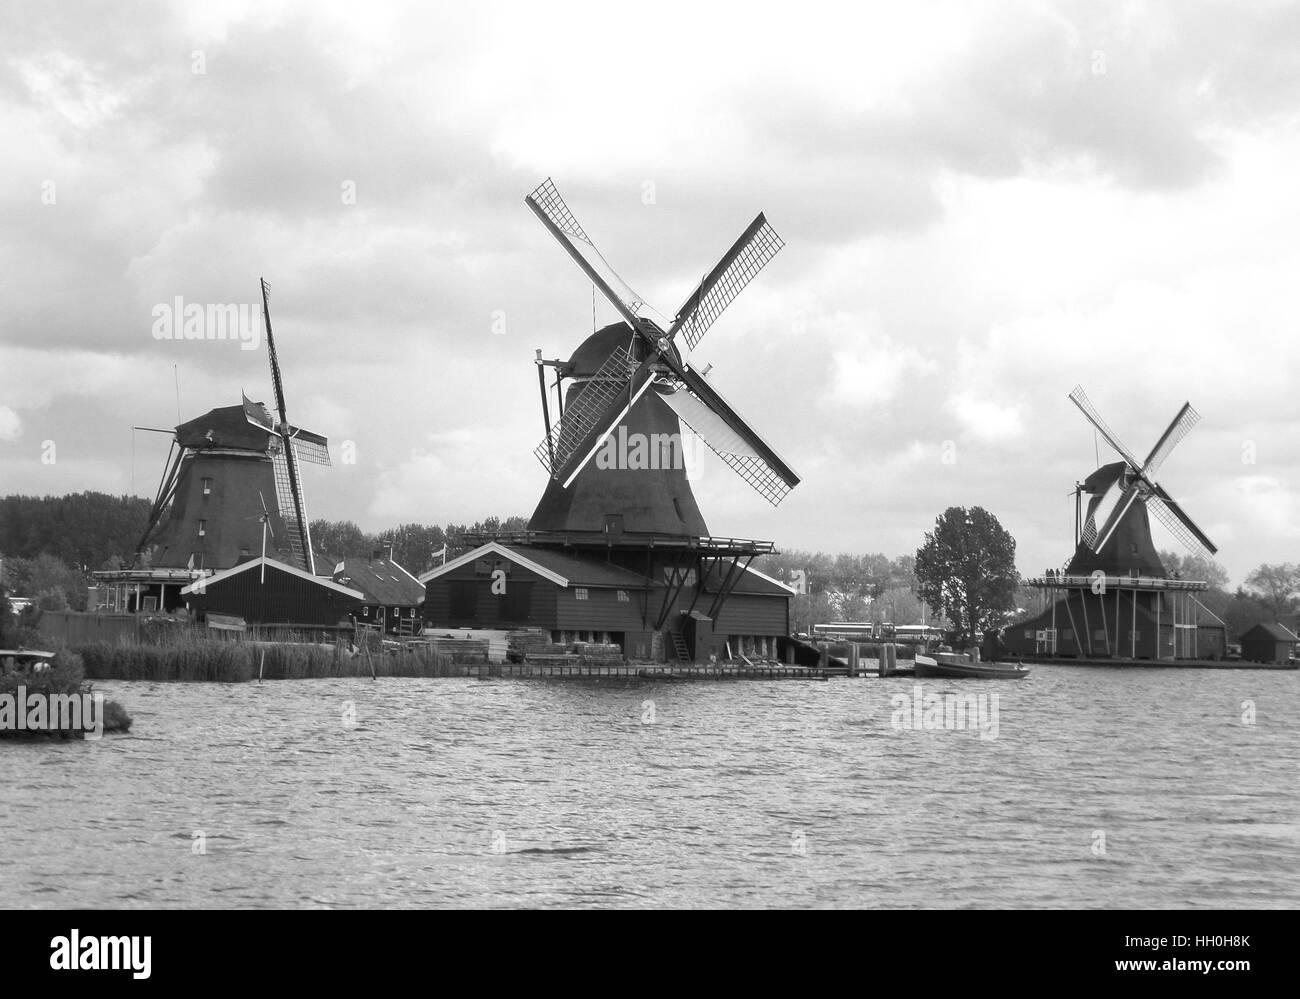 Three waterfront Dutch windmills under the cloudy sky, Zaanse Schans, Netherlands, Monochrome photo - Stock Image